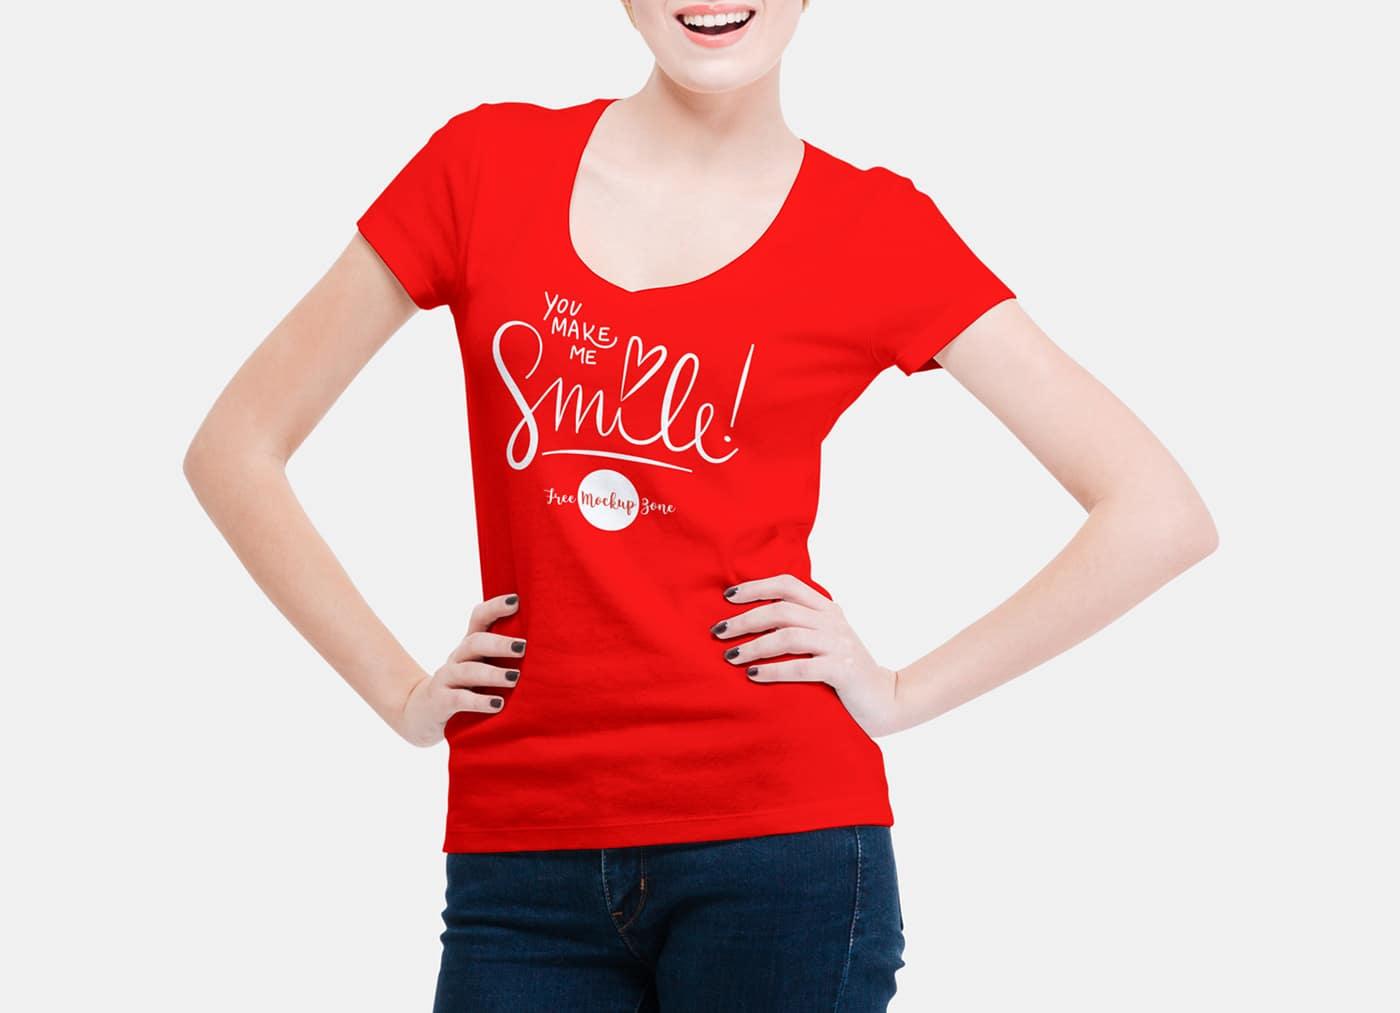 V-Neck Women T-shirt PSD Mockup - Free Download